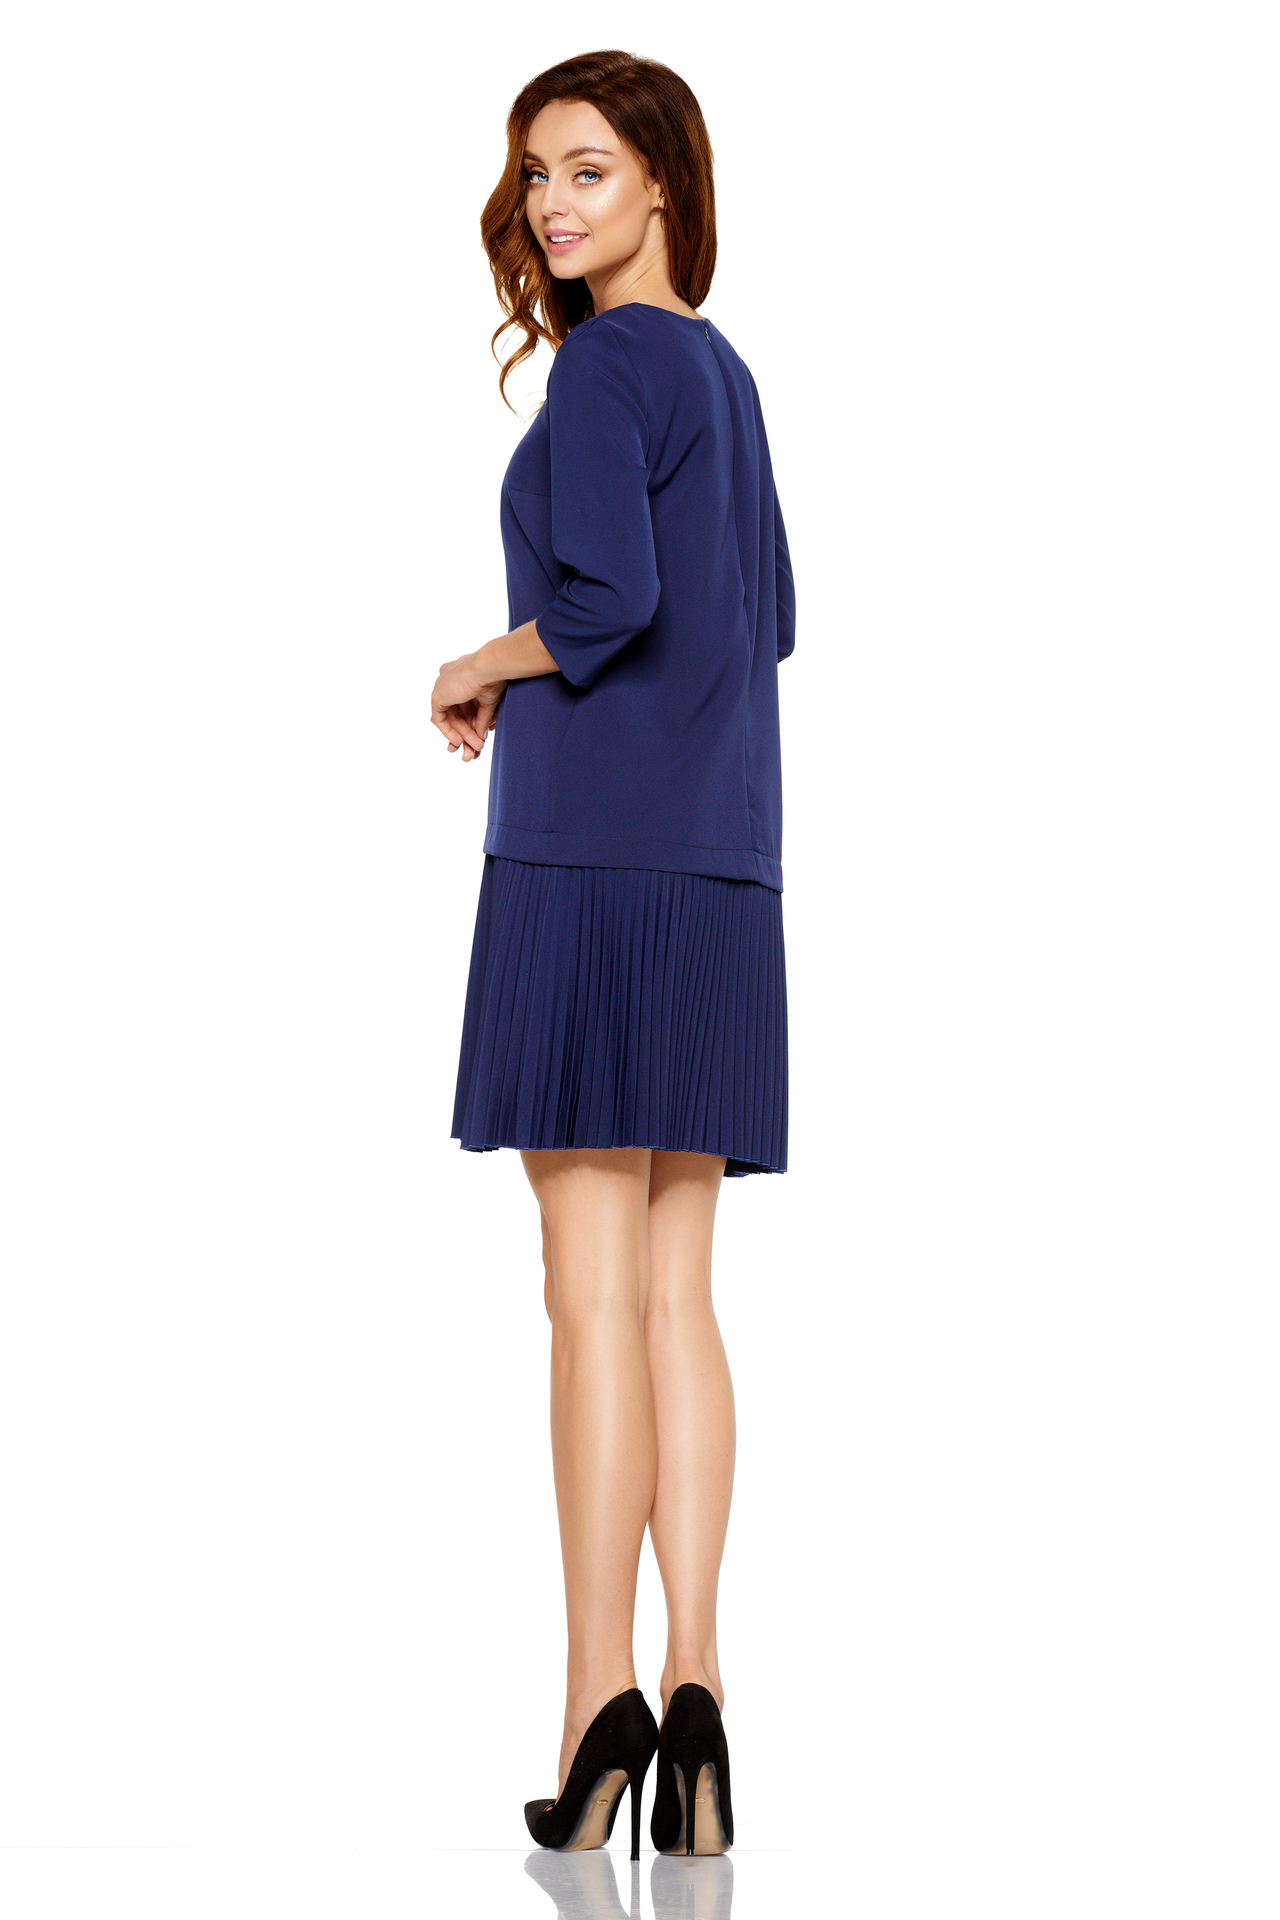 501ca3b0dec1 Lemoniade – Tmavo modré jednoduché šaty s plisovanou sukňou L266